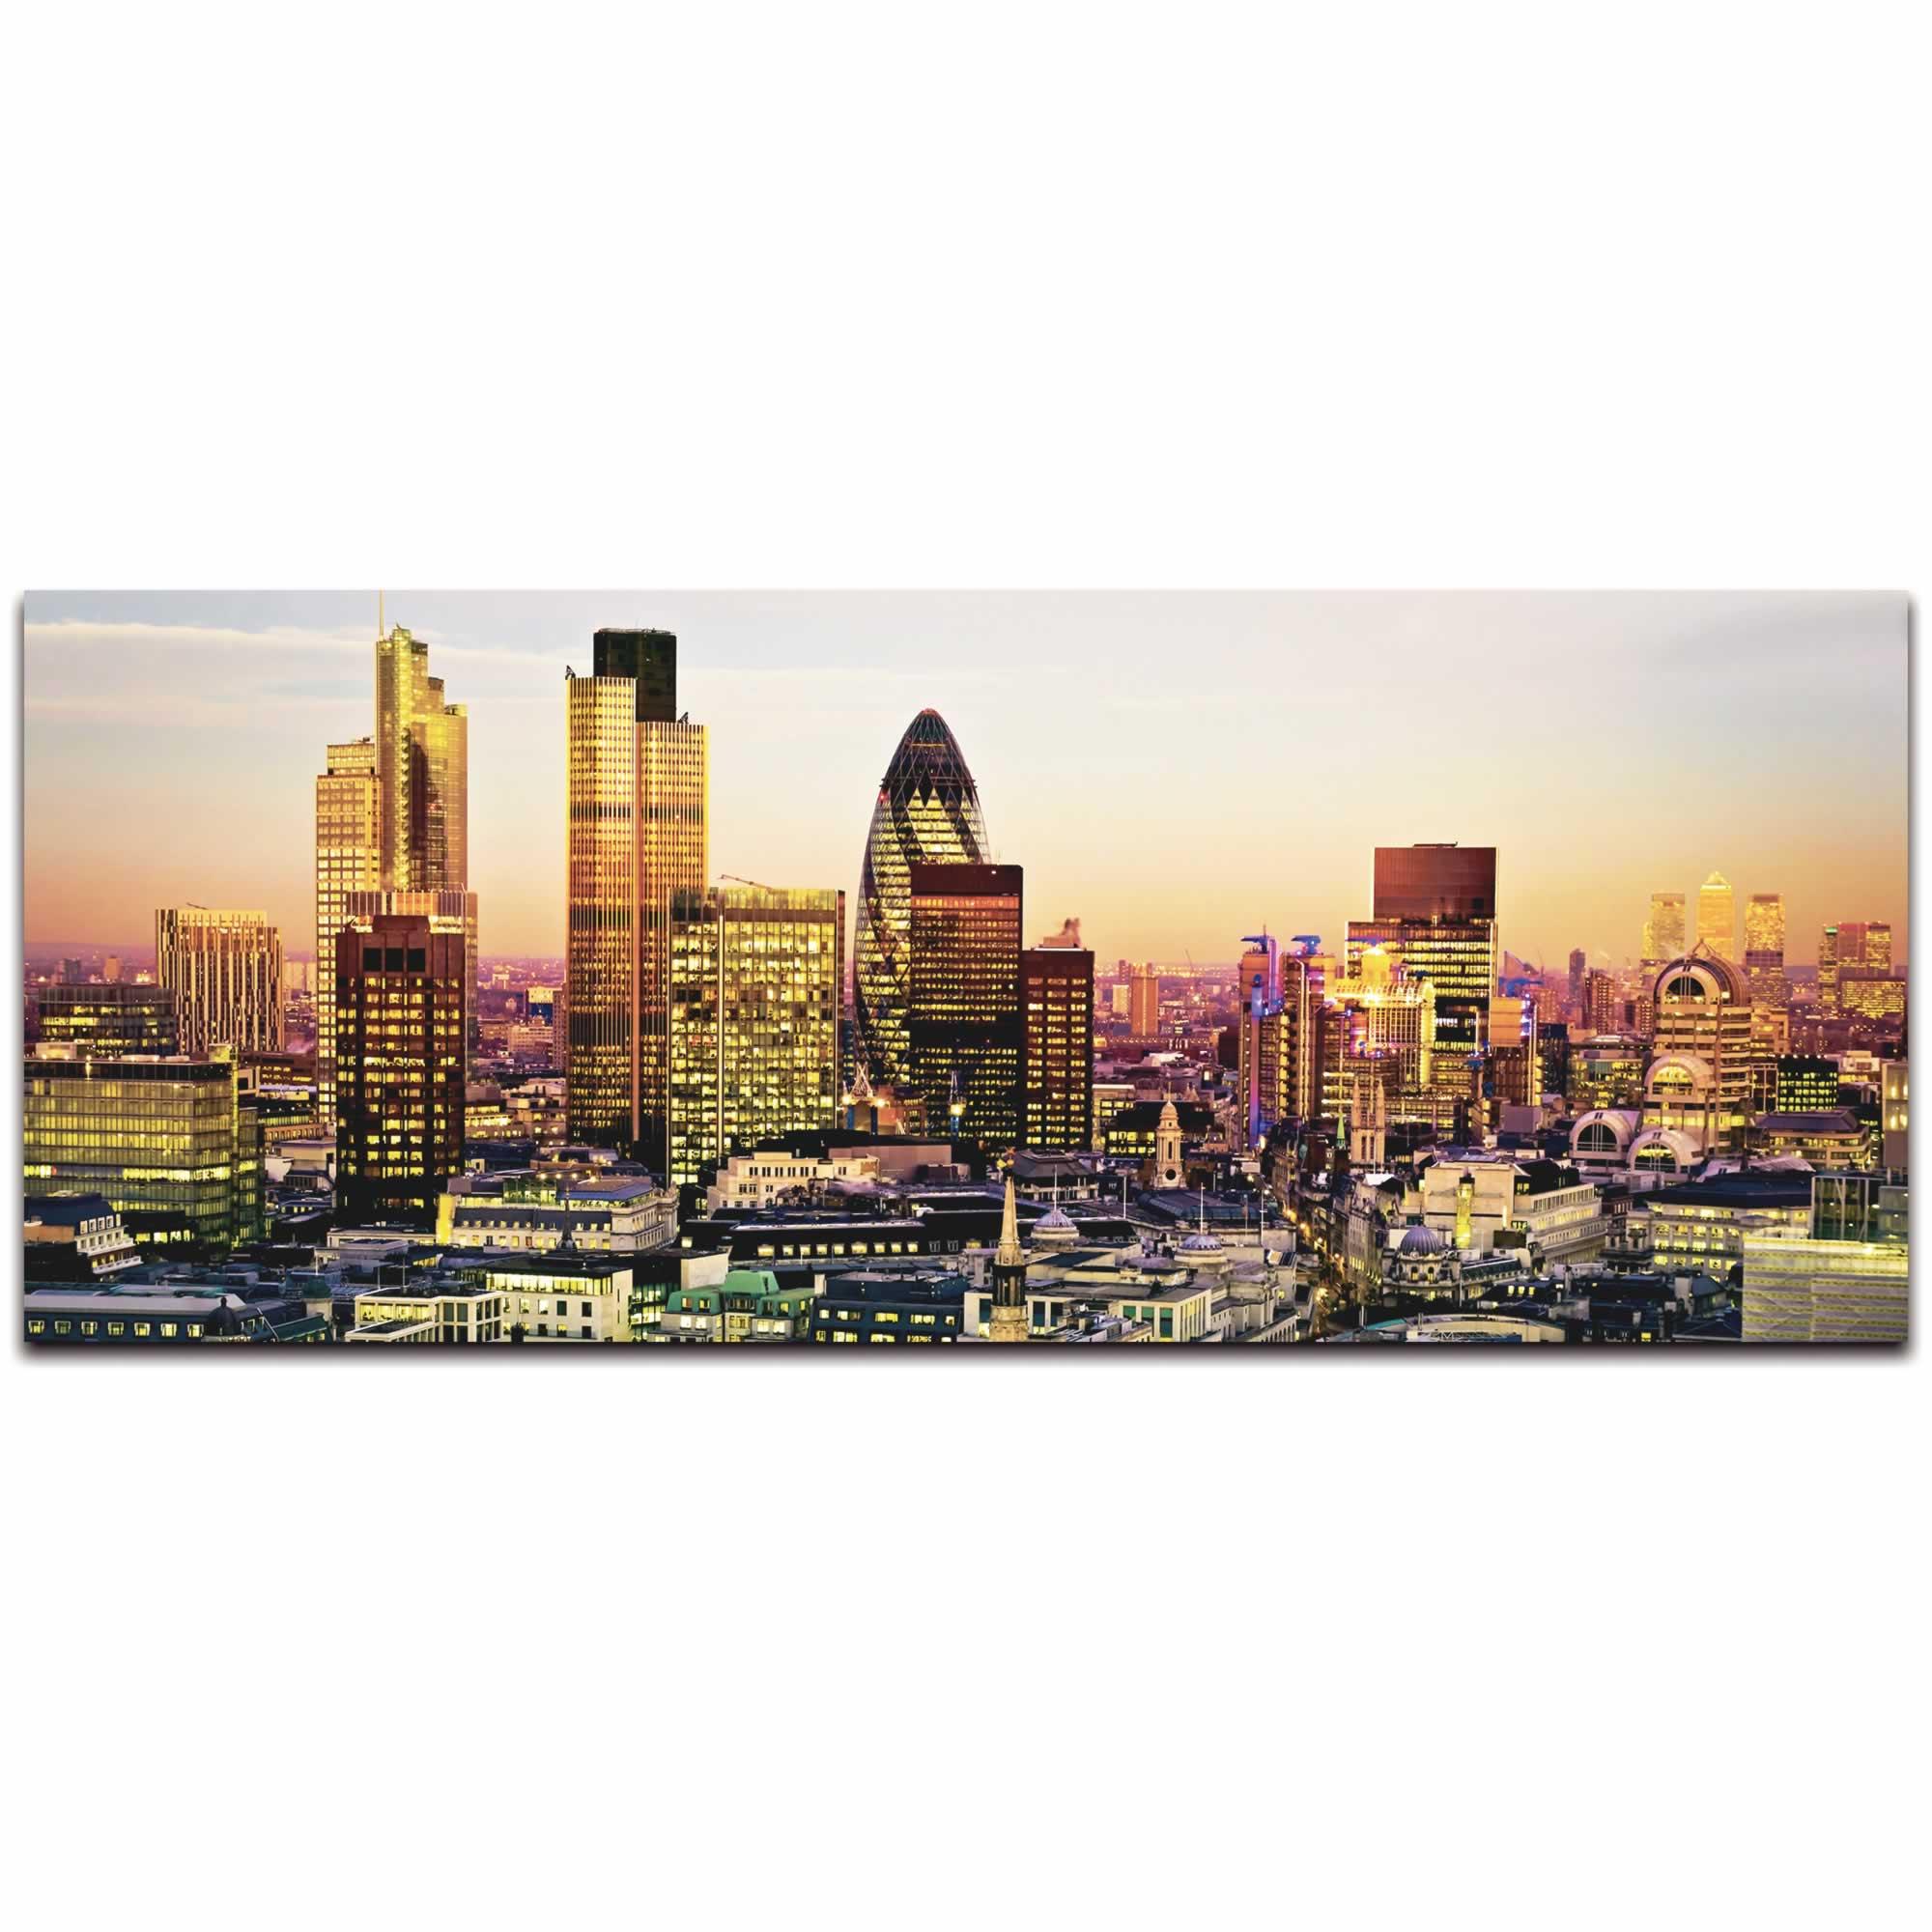 Modern London City Skyline - Urban Modern Art, Designer Home Decor, Cityscape Wall Artwork, Trendy Contemporary Art - Alternate View 2